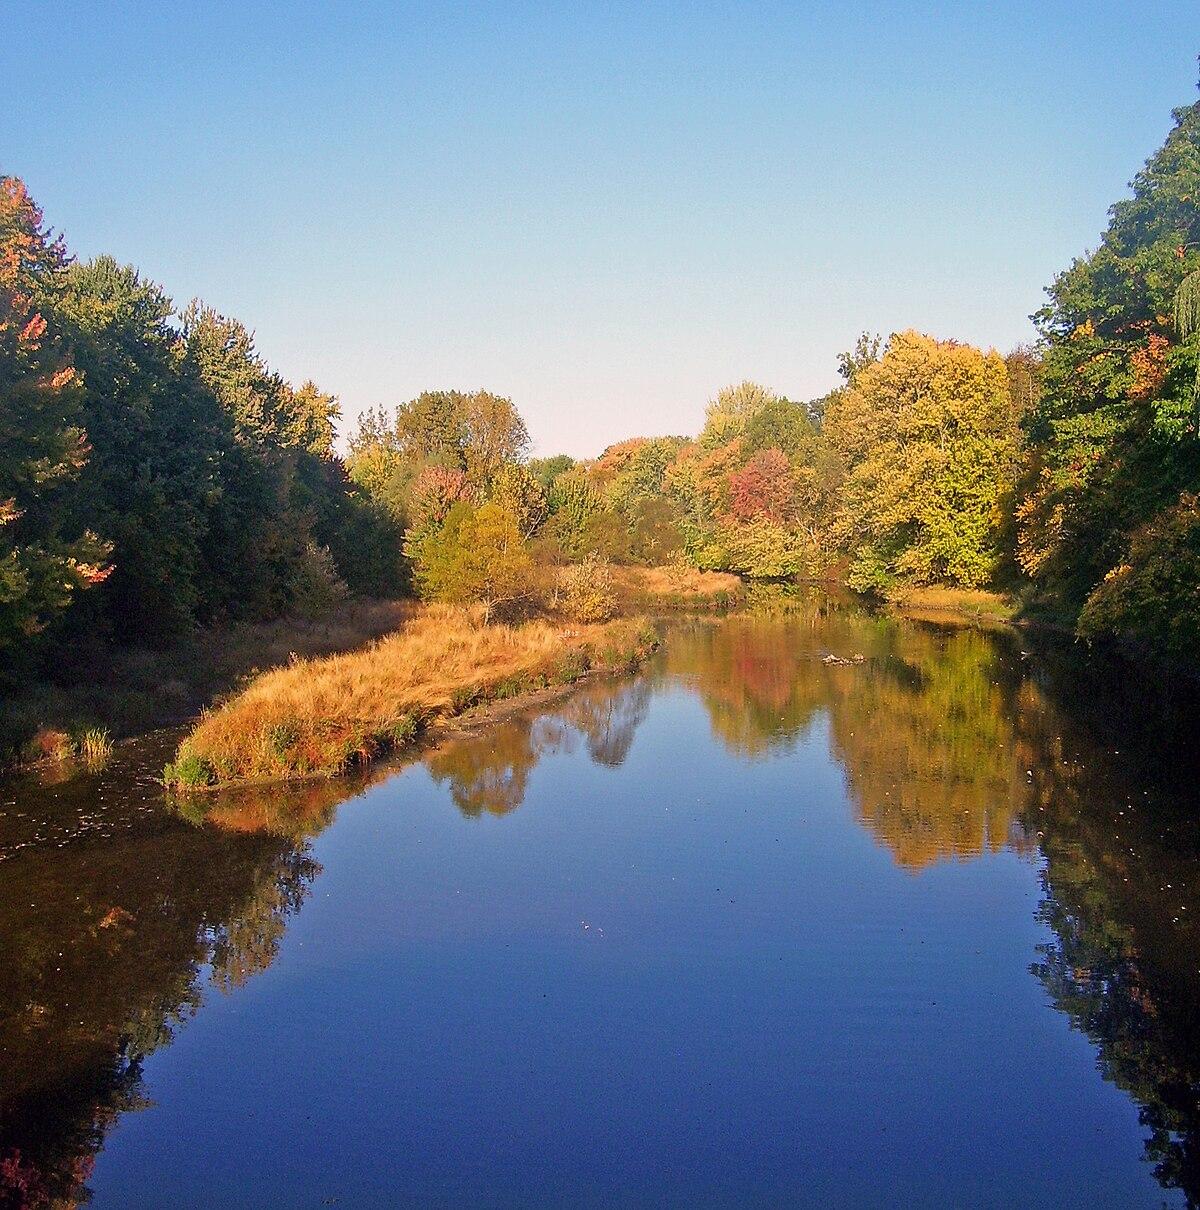 Fishkill creek wikipedia for Union valley reservoir fishing